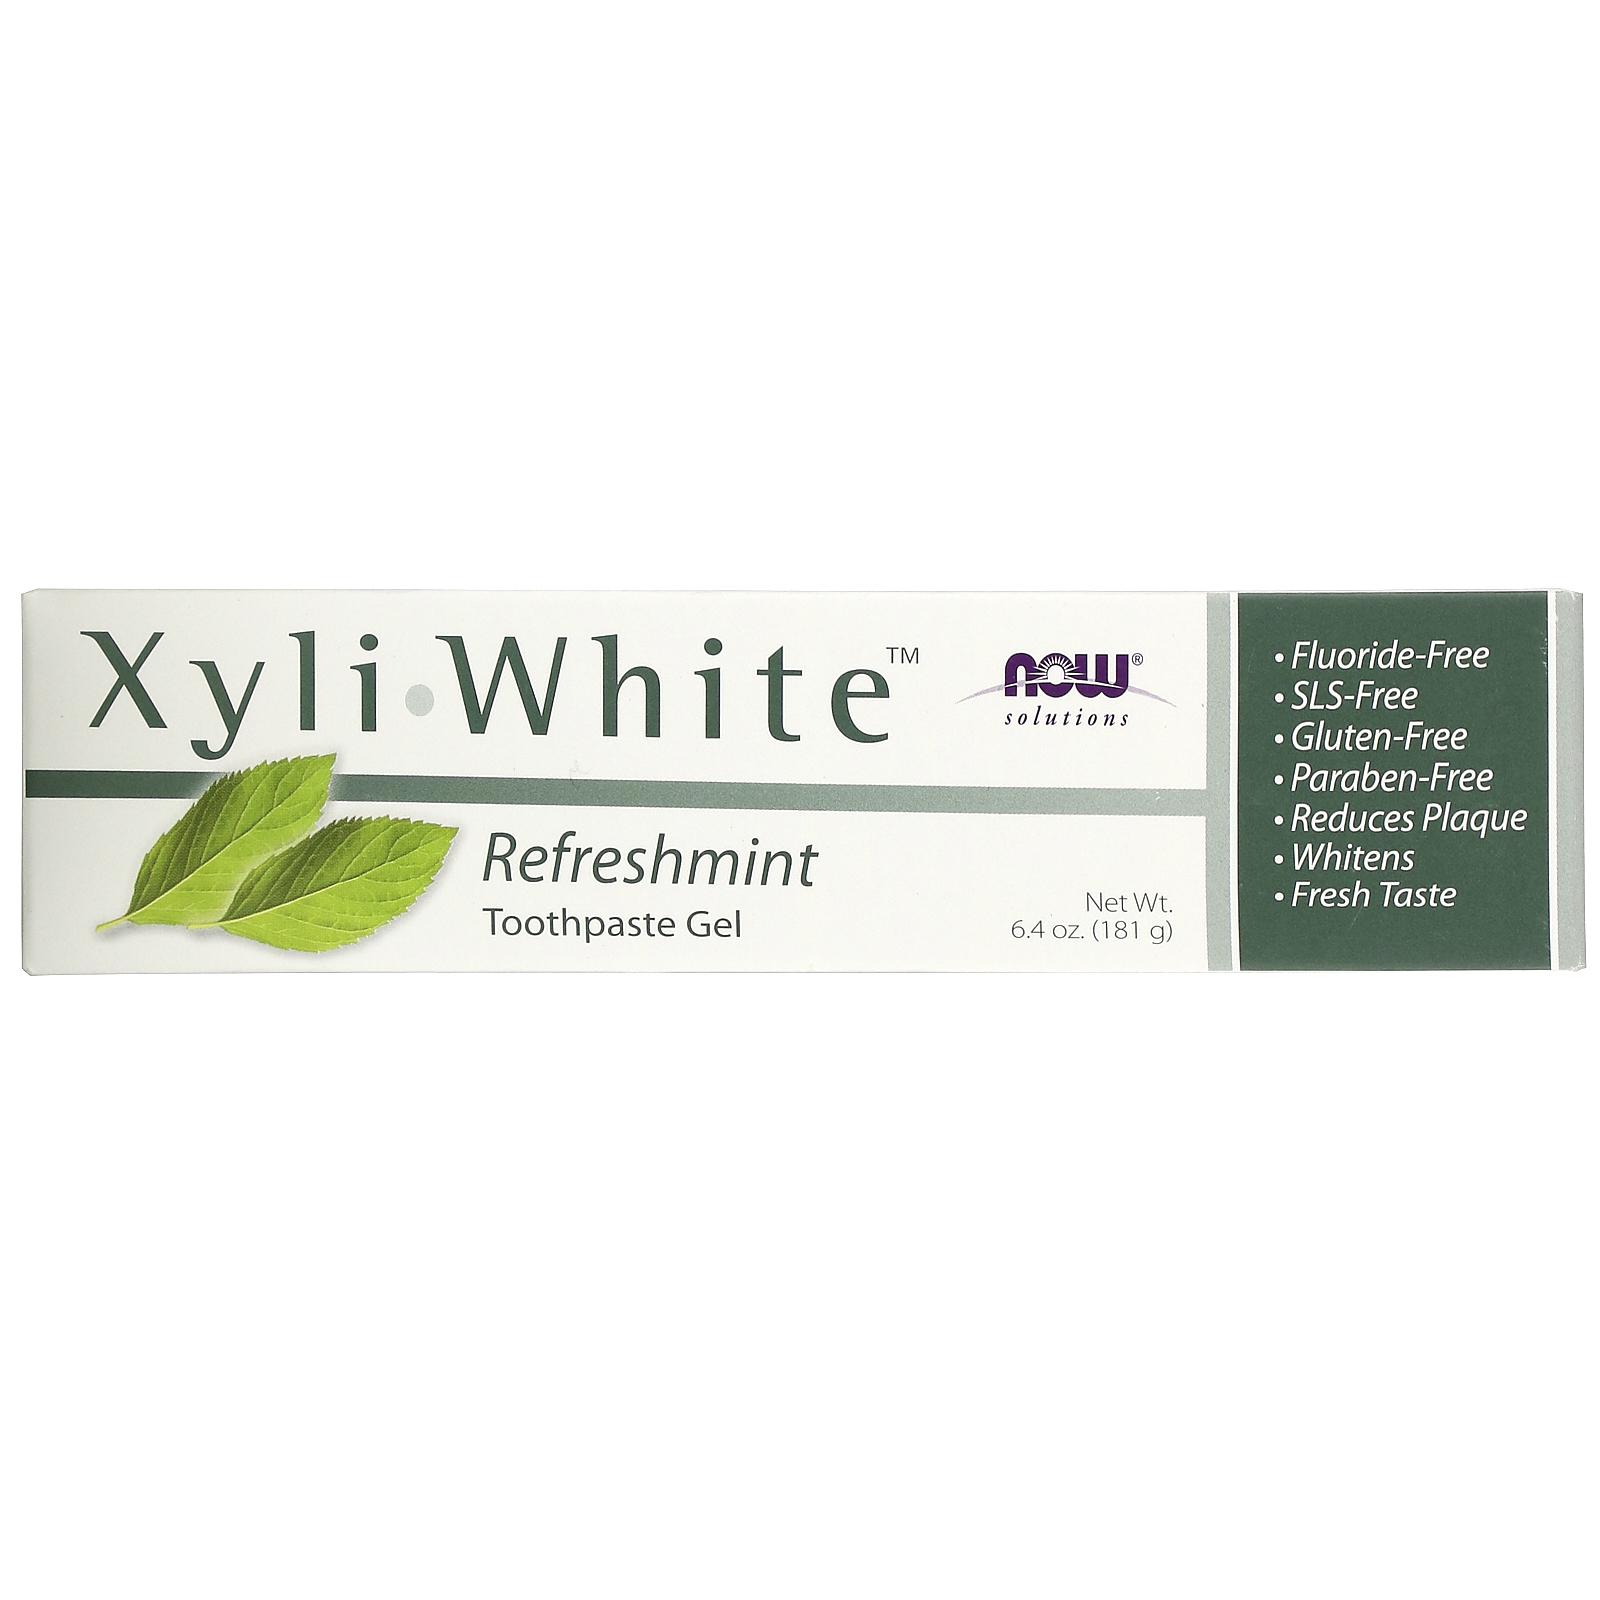 Now Foods, جل الأسنان Xyli-White، Solutions، خالِ من الفلورايد، بالنعناع المنعش، 6.4 أونصة (181 جم)